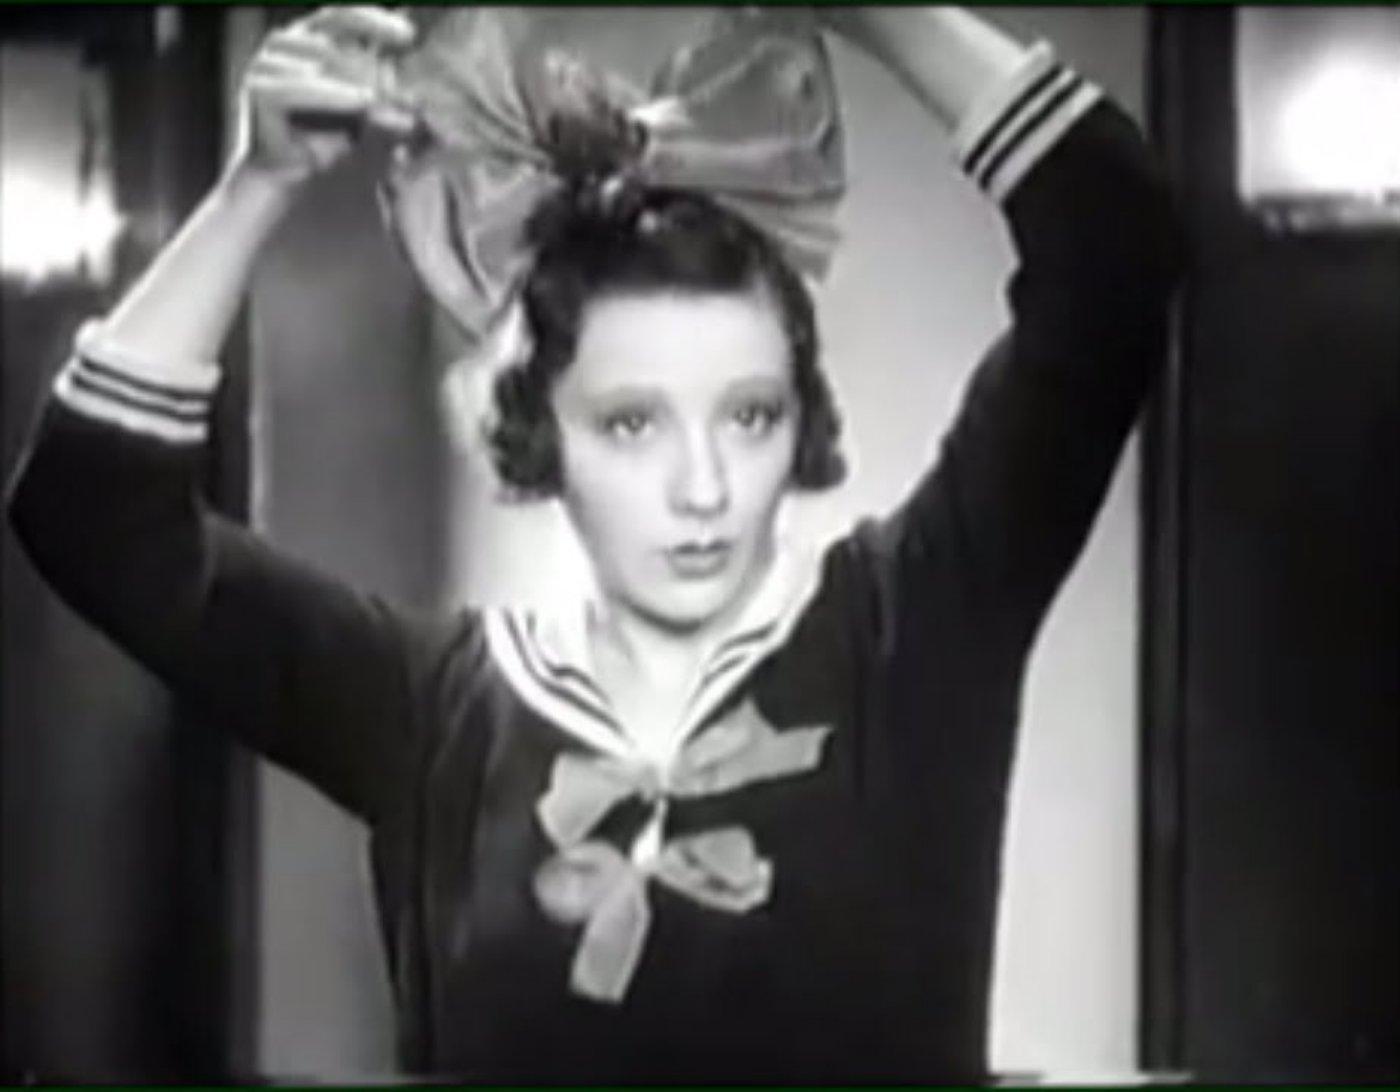 a-precocious-girl-1934-csibi-der-fratz-neufeld-recensione